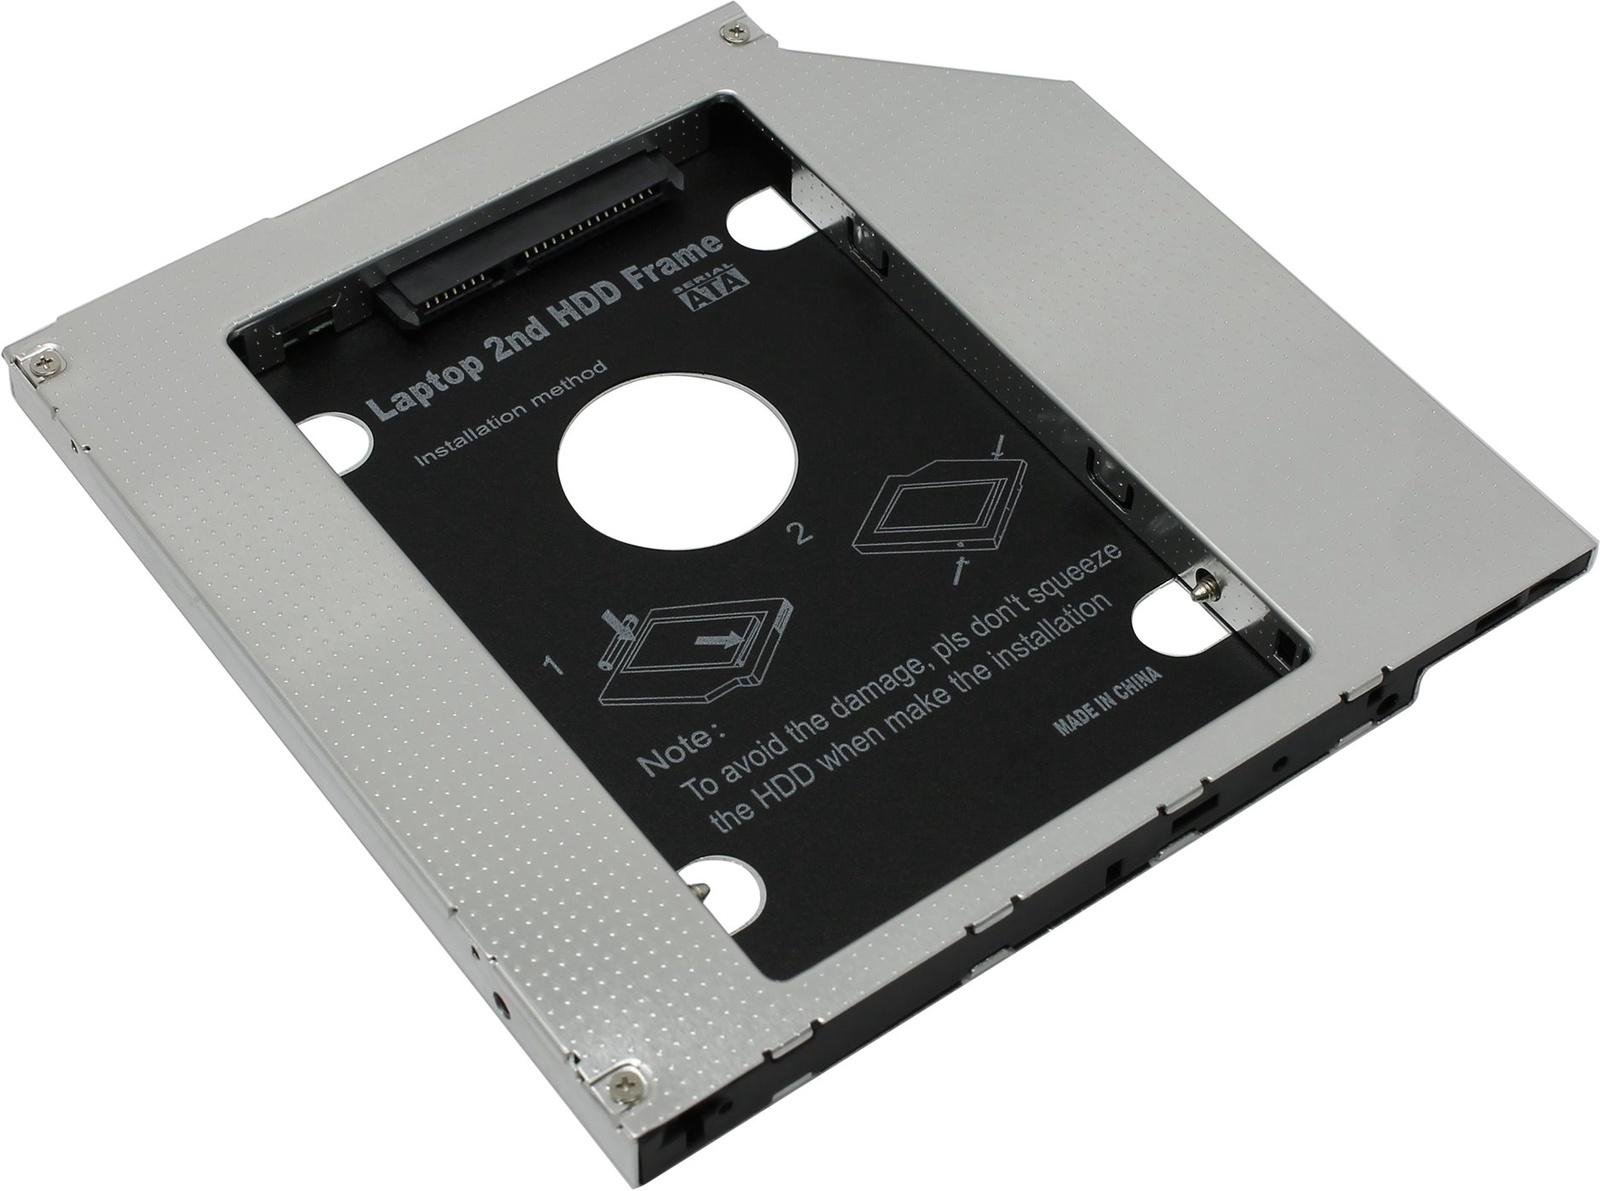 SS95, Адаптер оптибей SATA/miniSATA (SlimSATA) для подключения HDD/SSD 2,5 дюйма к ноутбуку вместо DVD, Espada переходник minisata sata